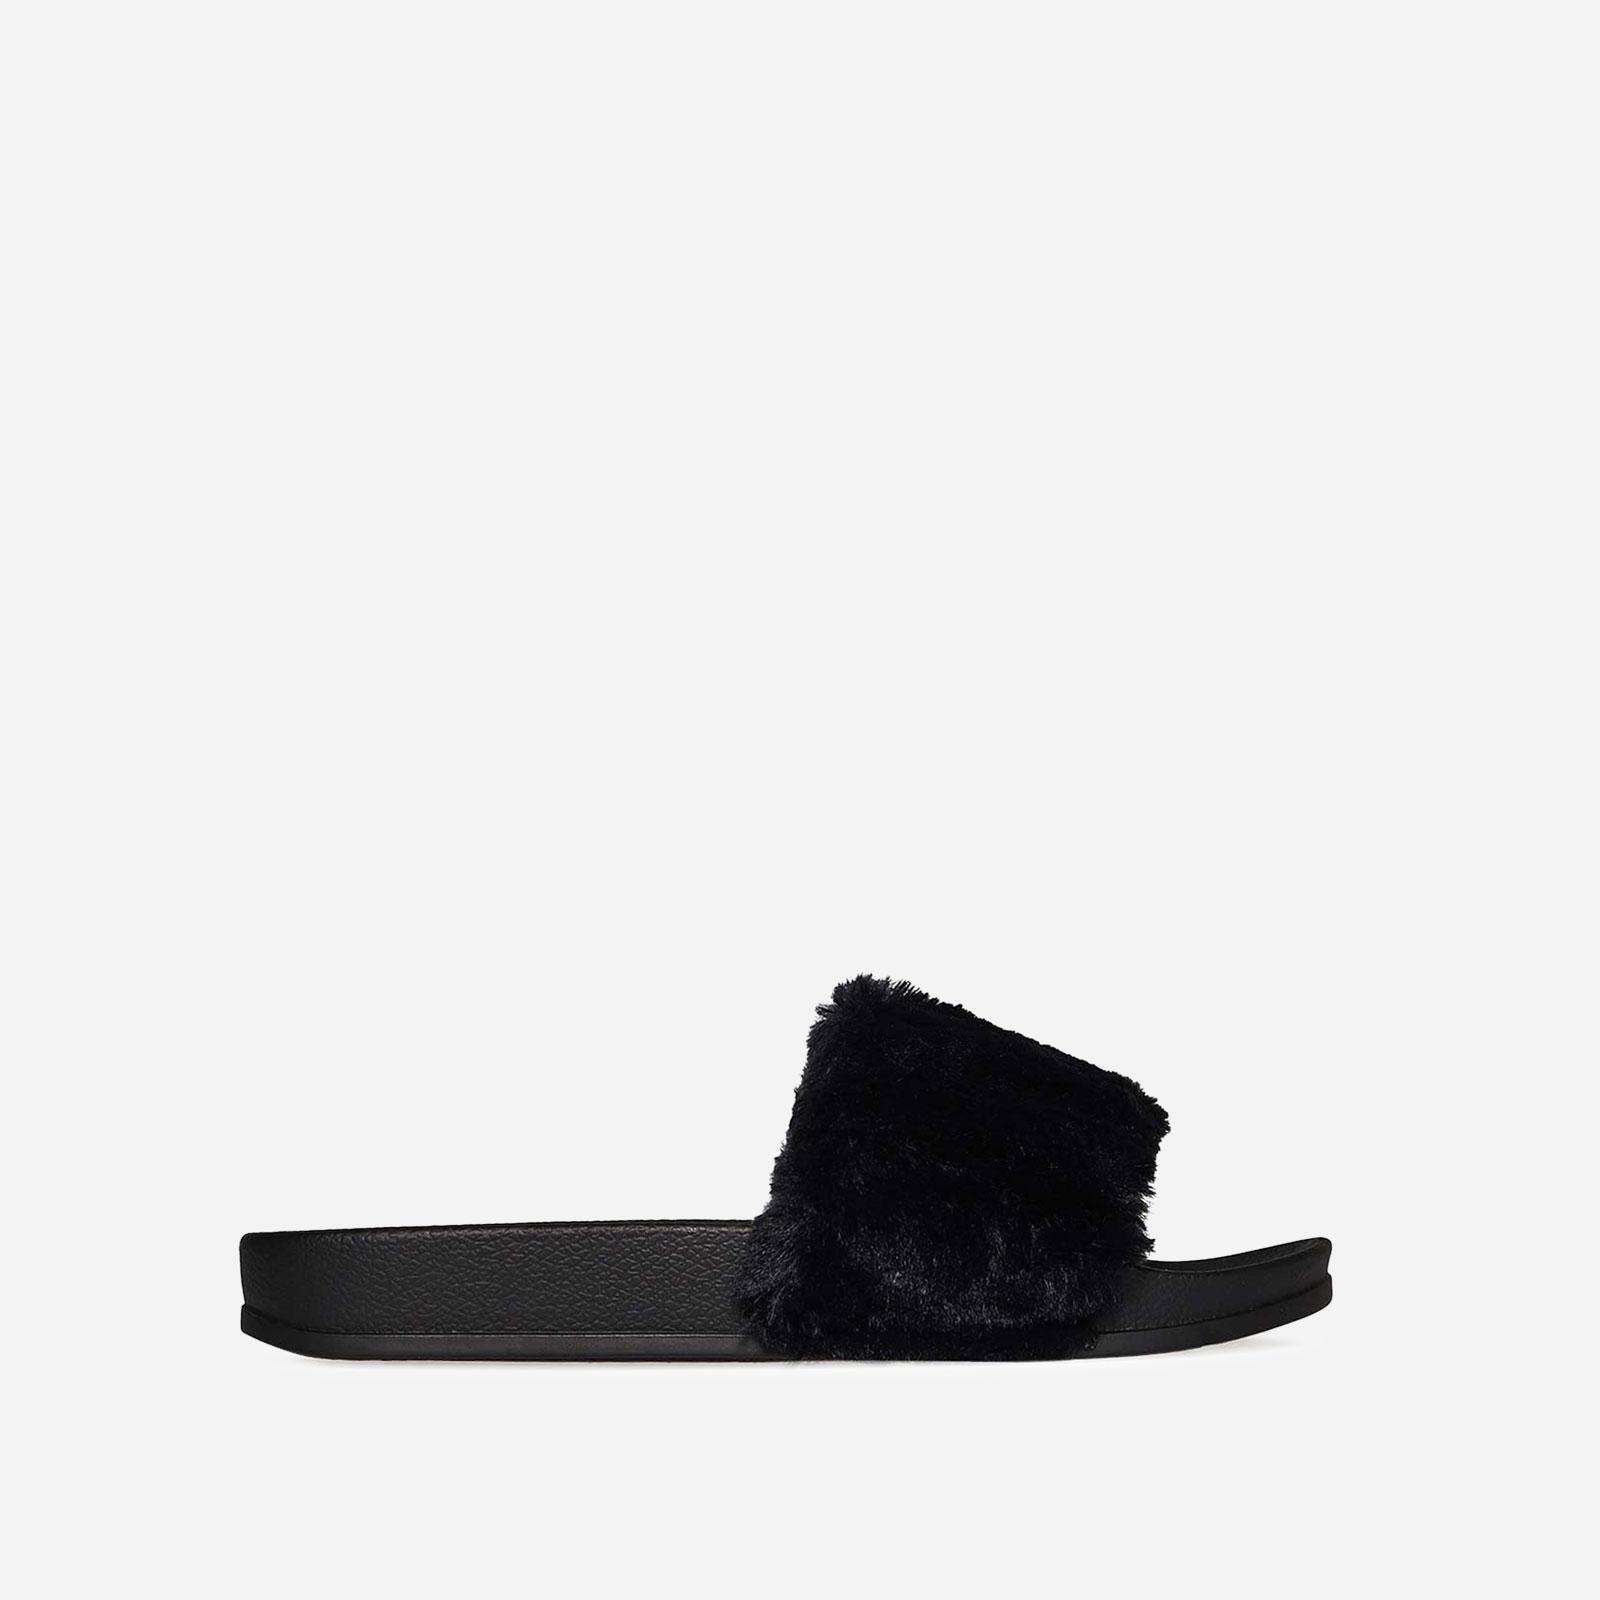 Farrah Rubber Slider With Faux Fur Trim In Black Image 1